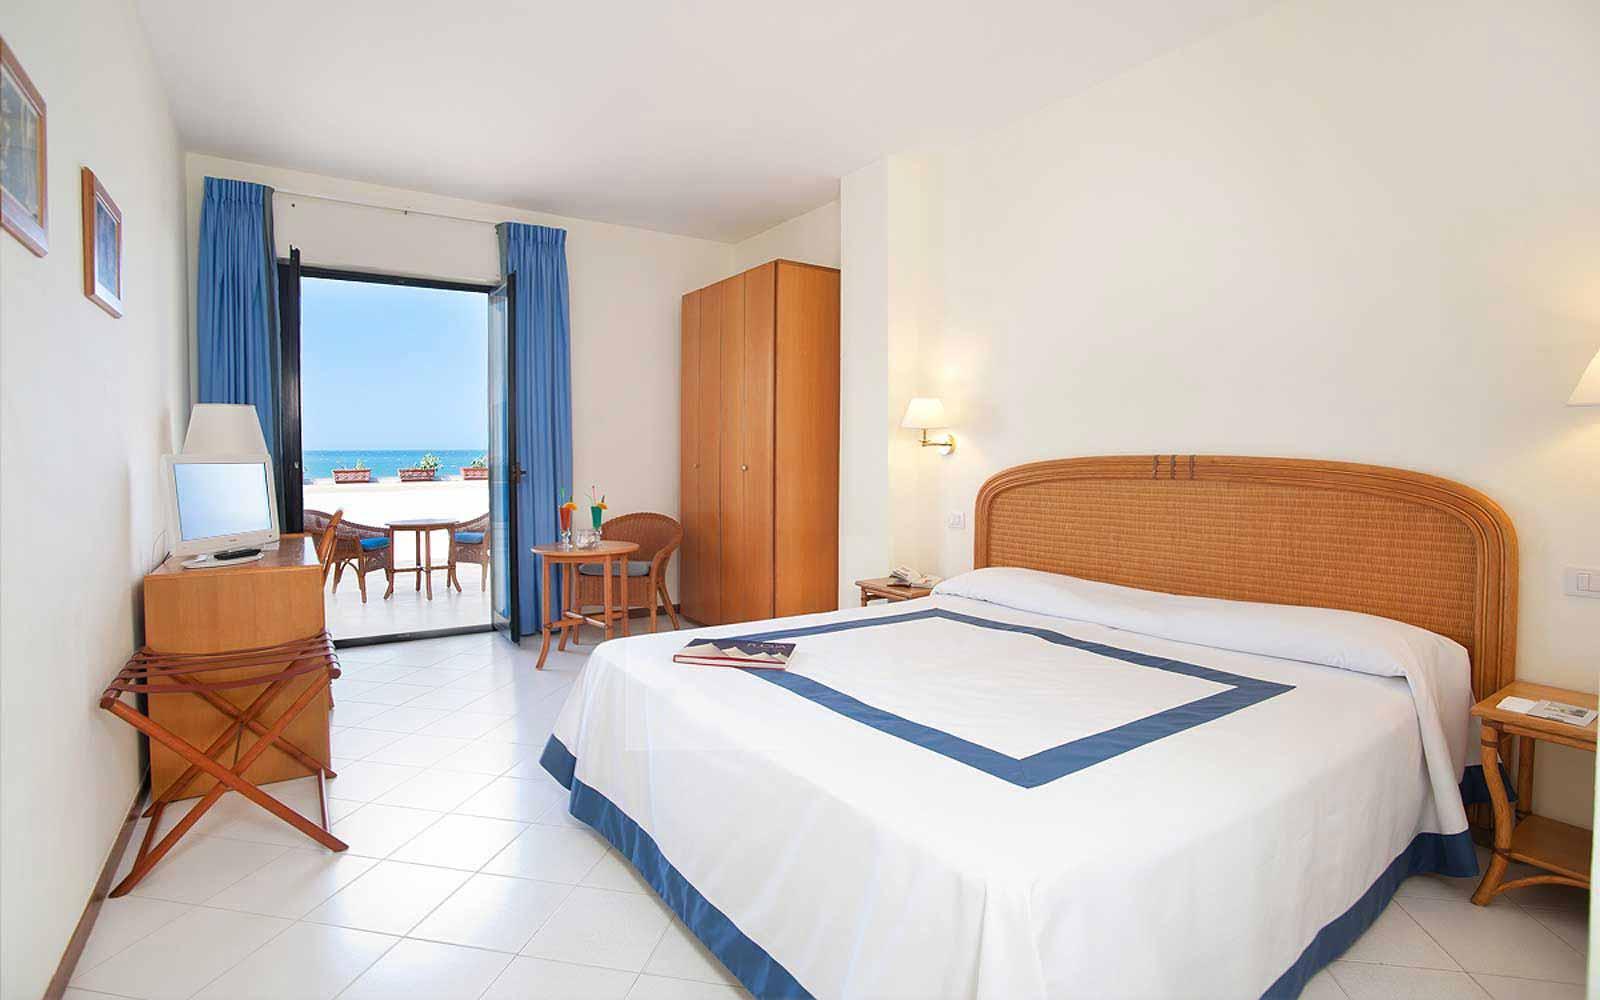 Standard room at Hotel Del Levante